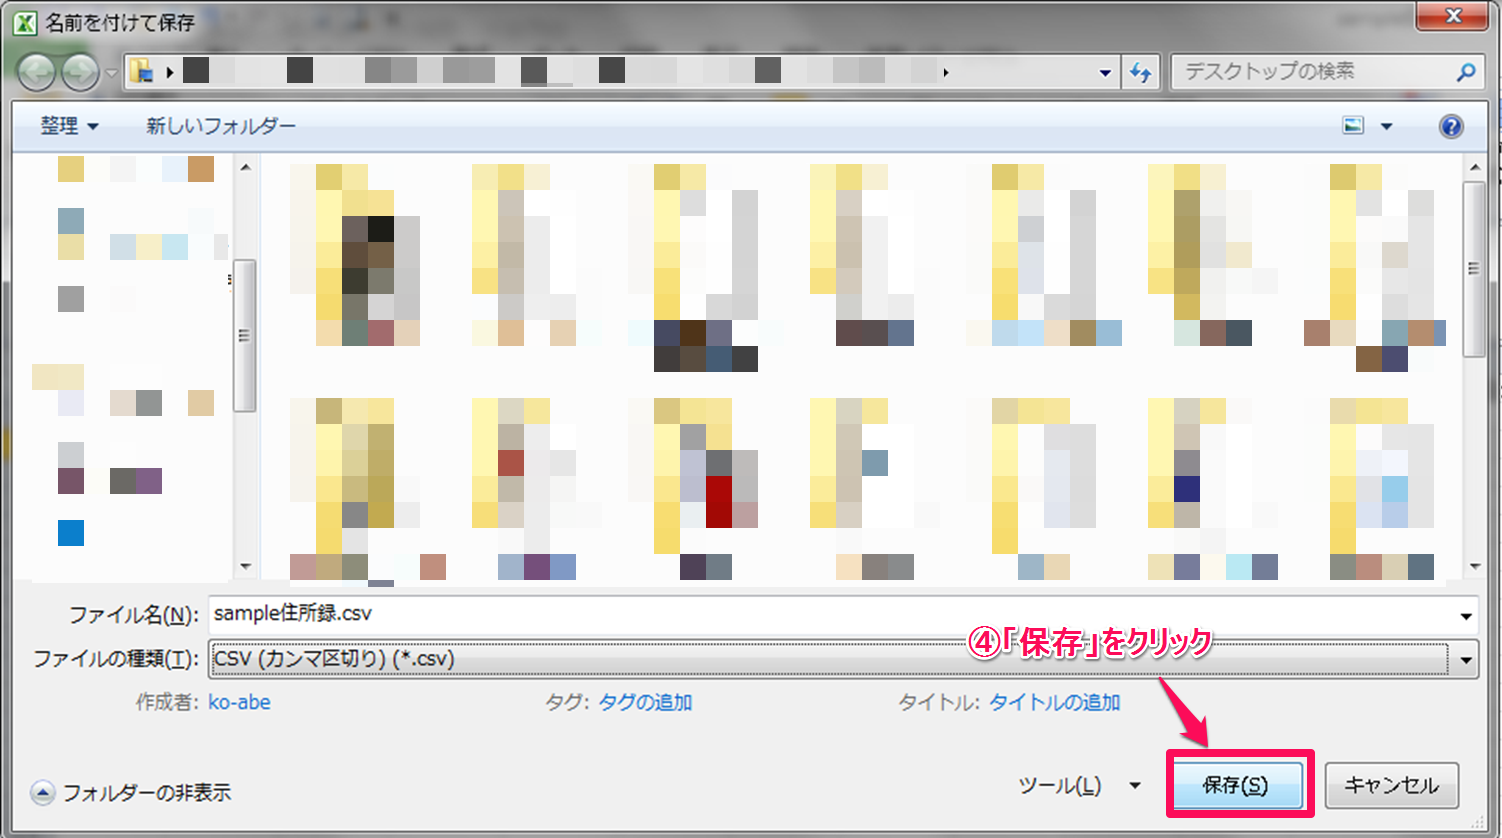 Excel→筆ぐるめ④